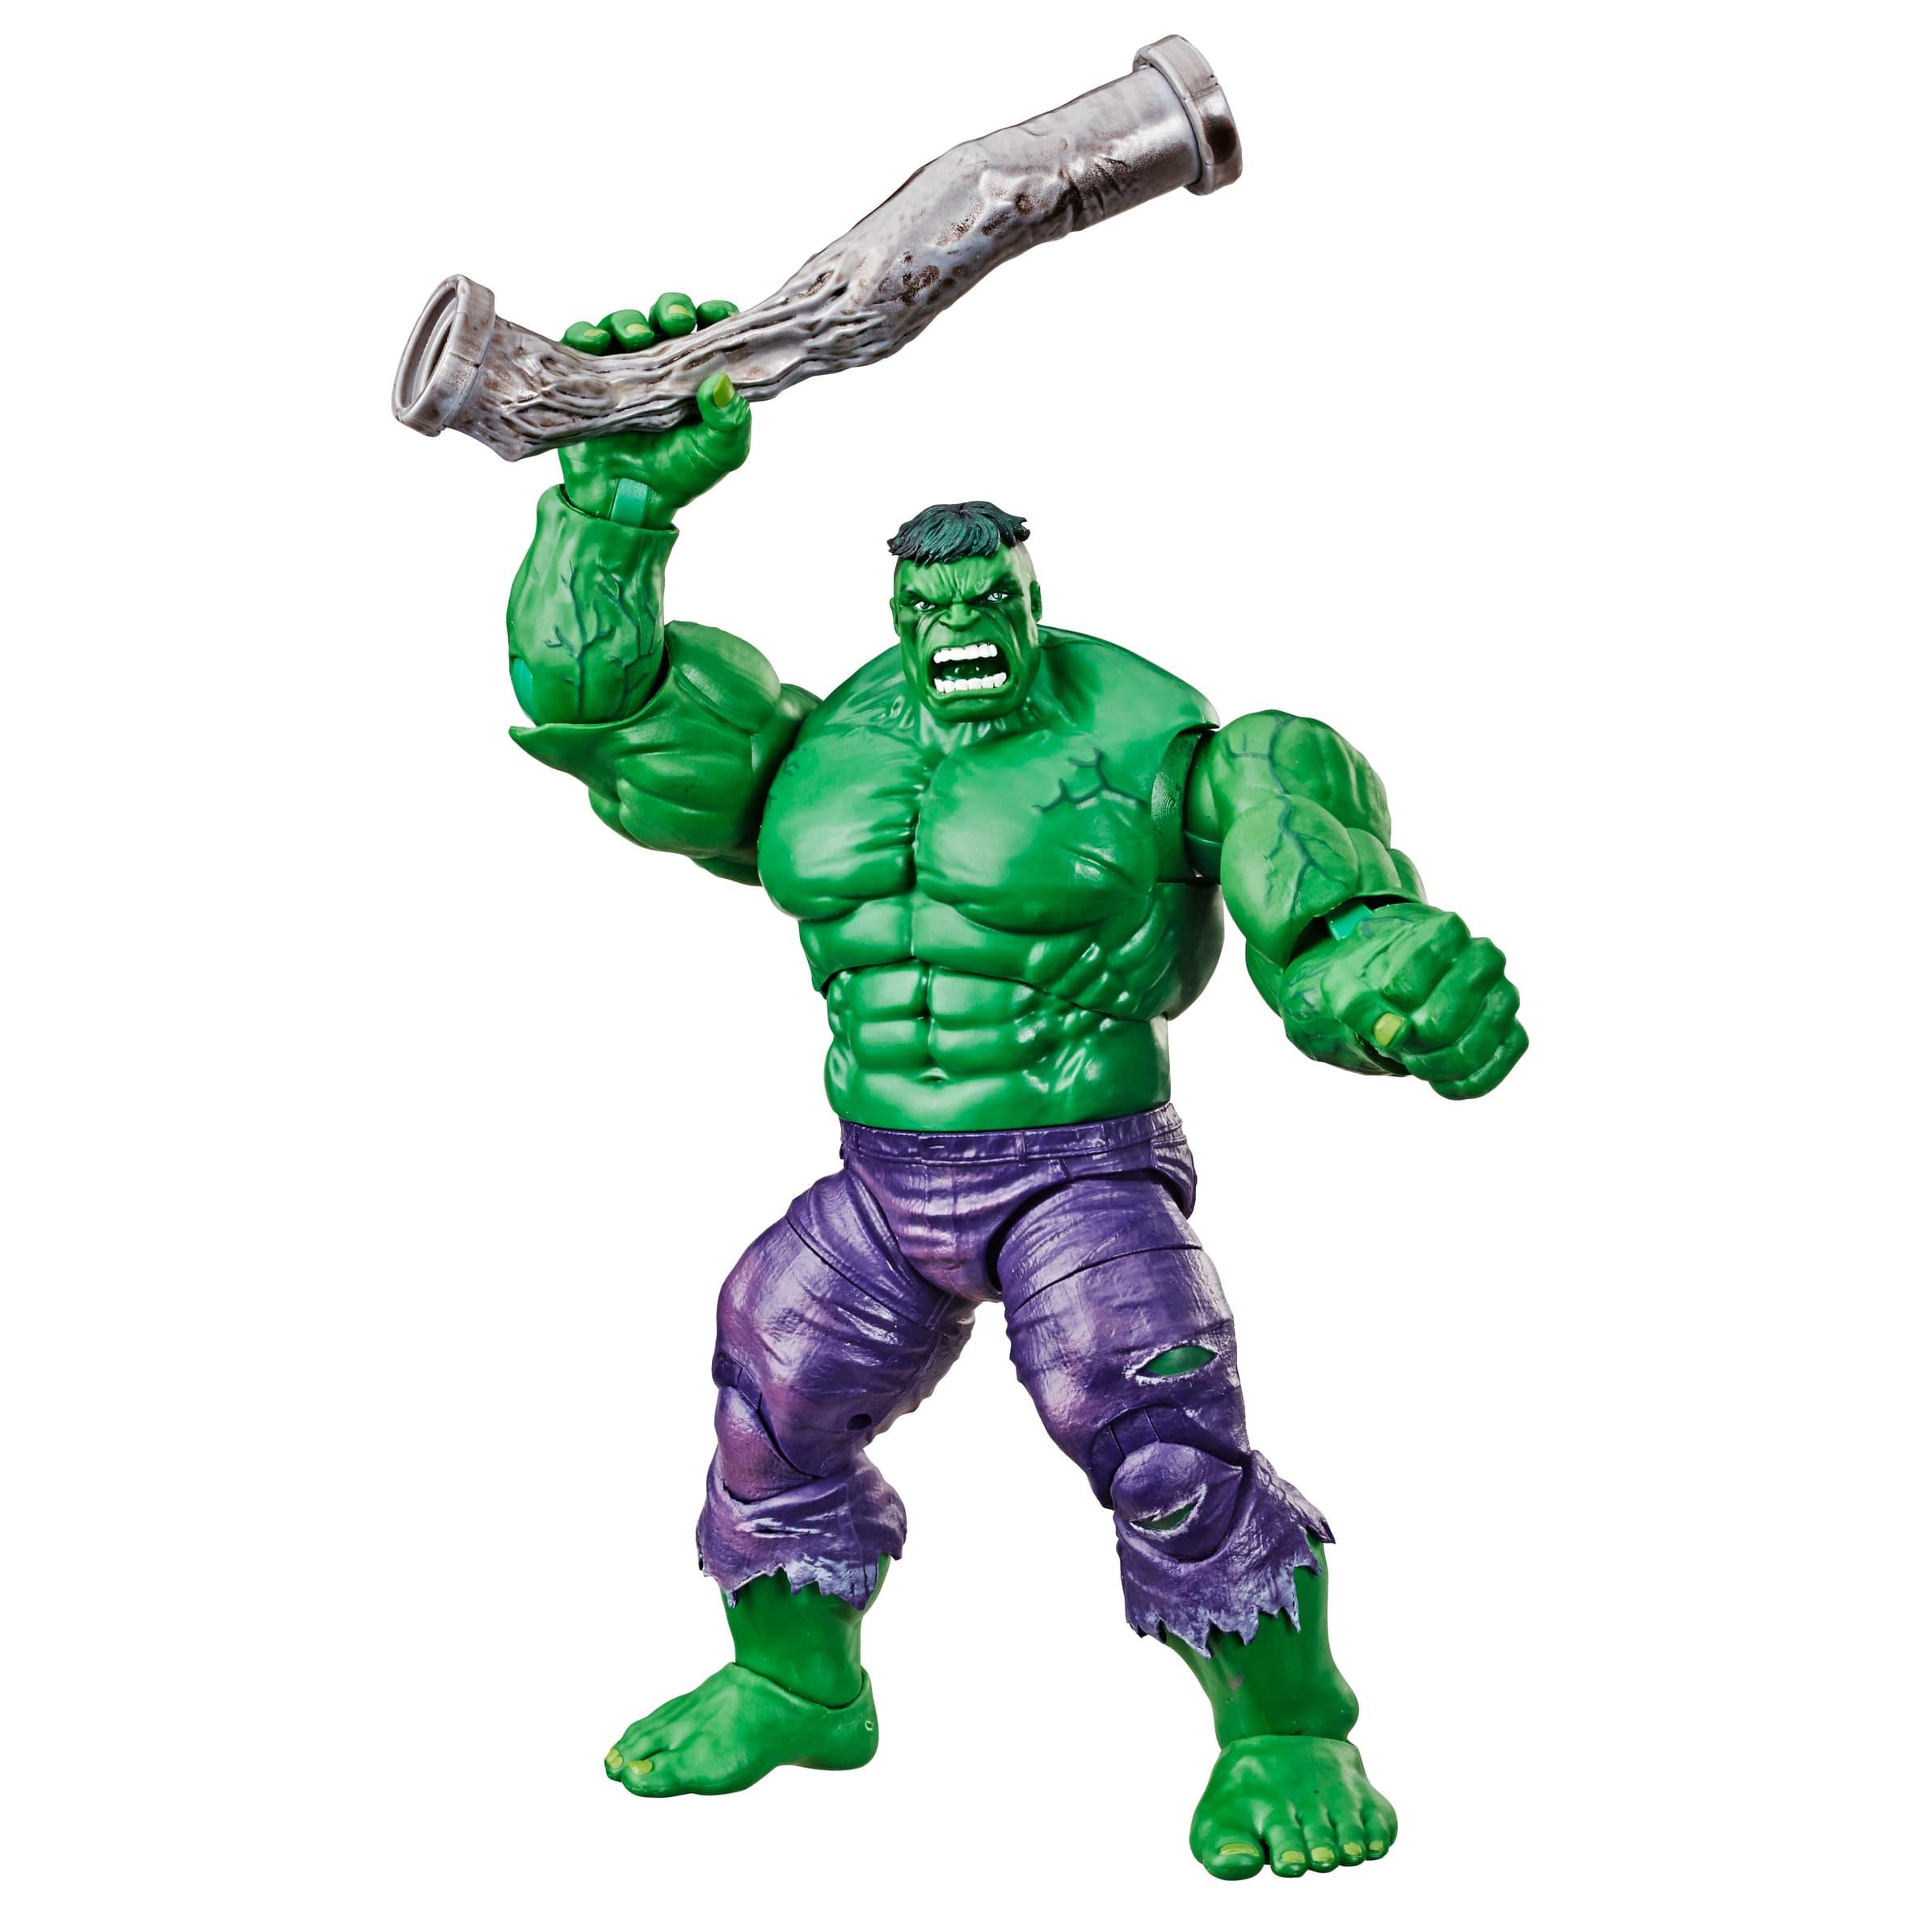 Marvel SDCC 2019 Hasbro Hulk